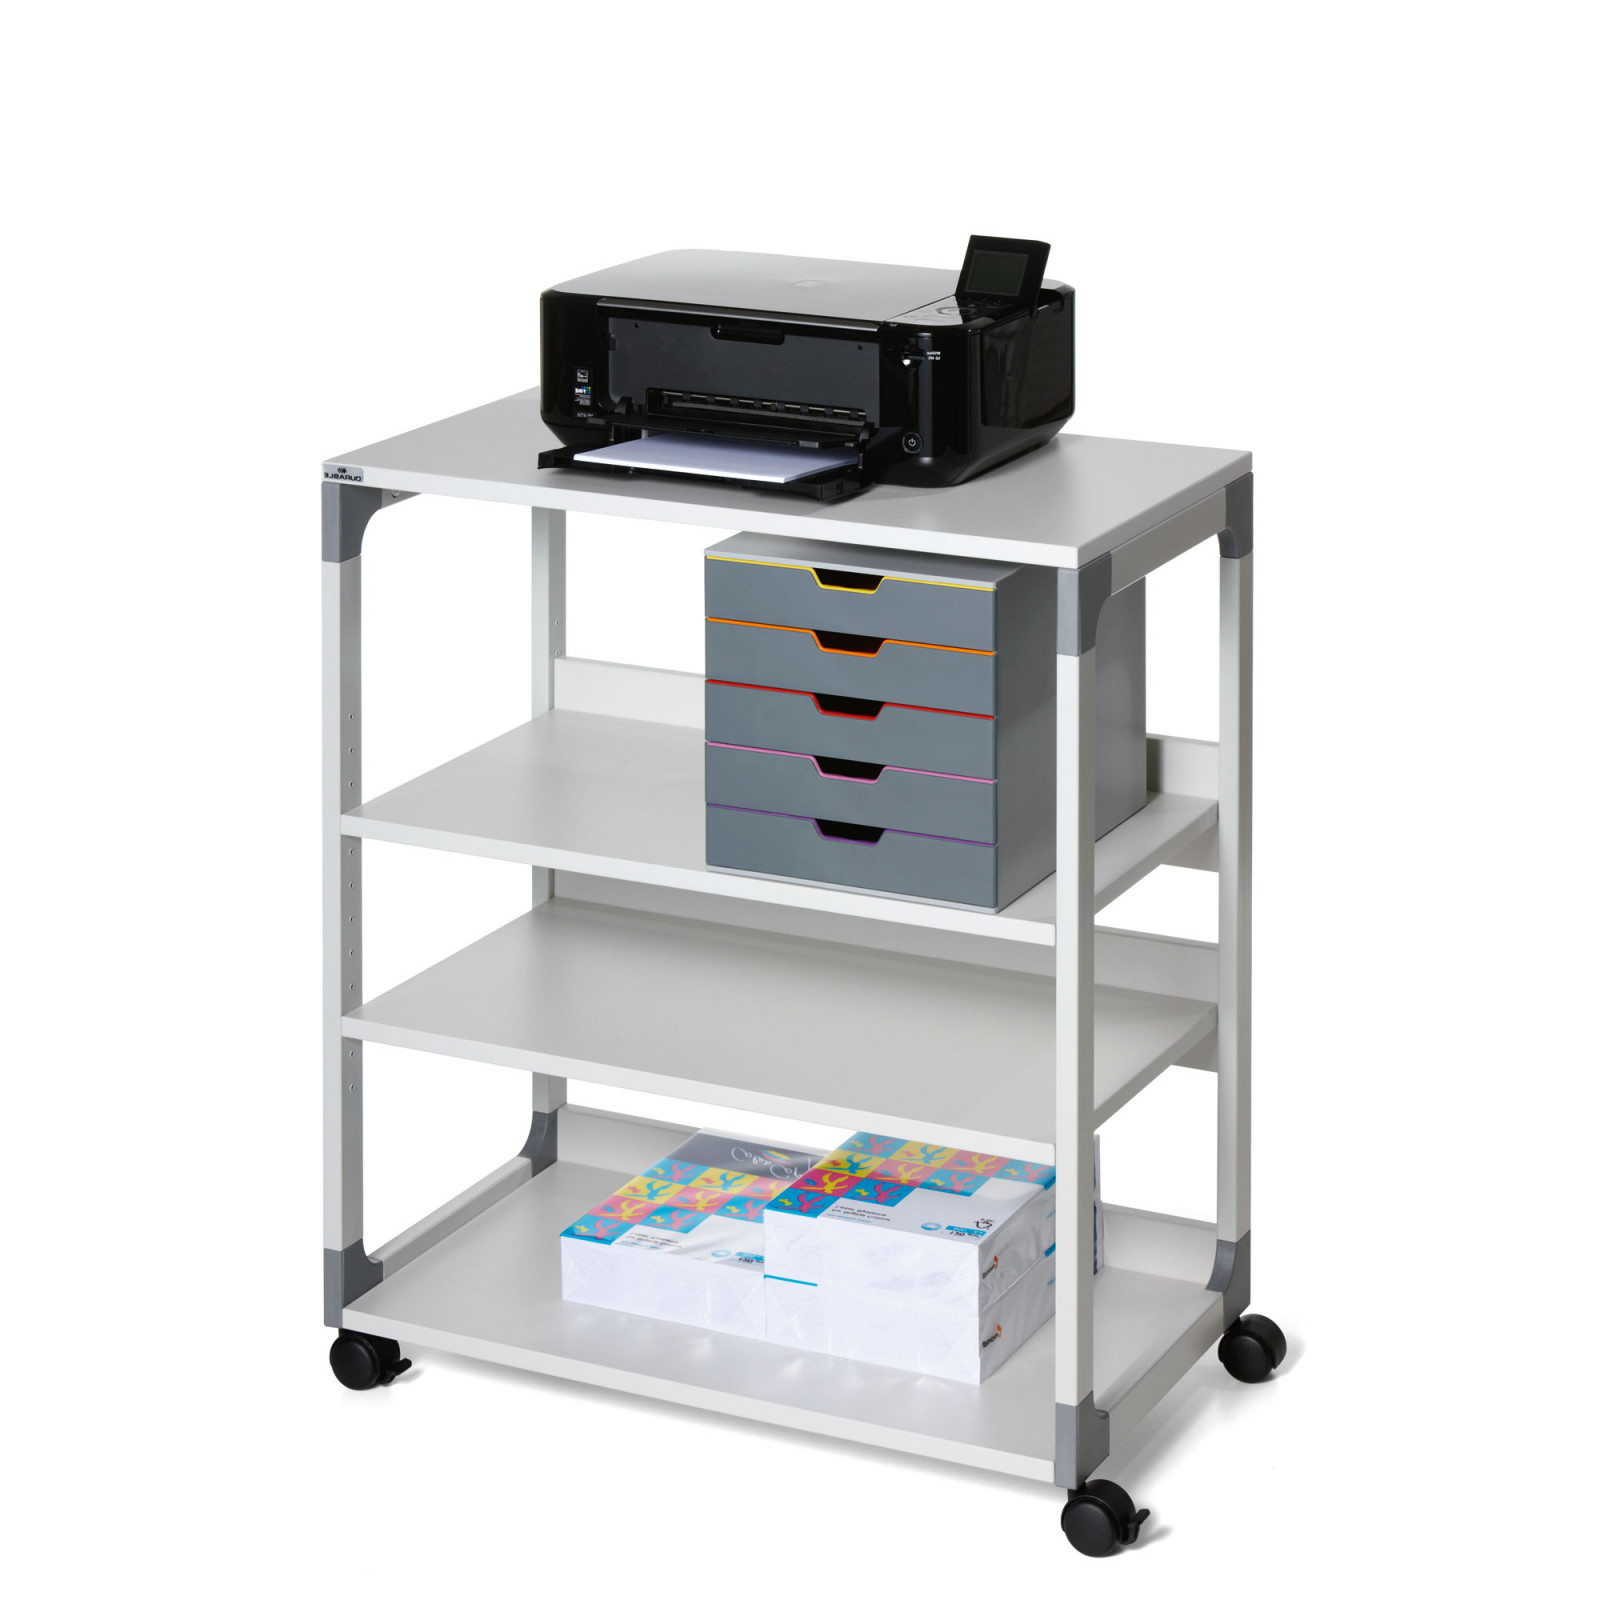 Mueble Impresora Nkde Mueble Impresora 4 Niveles Catà Logo De Mobiliario De Oficina Lyreco